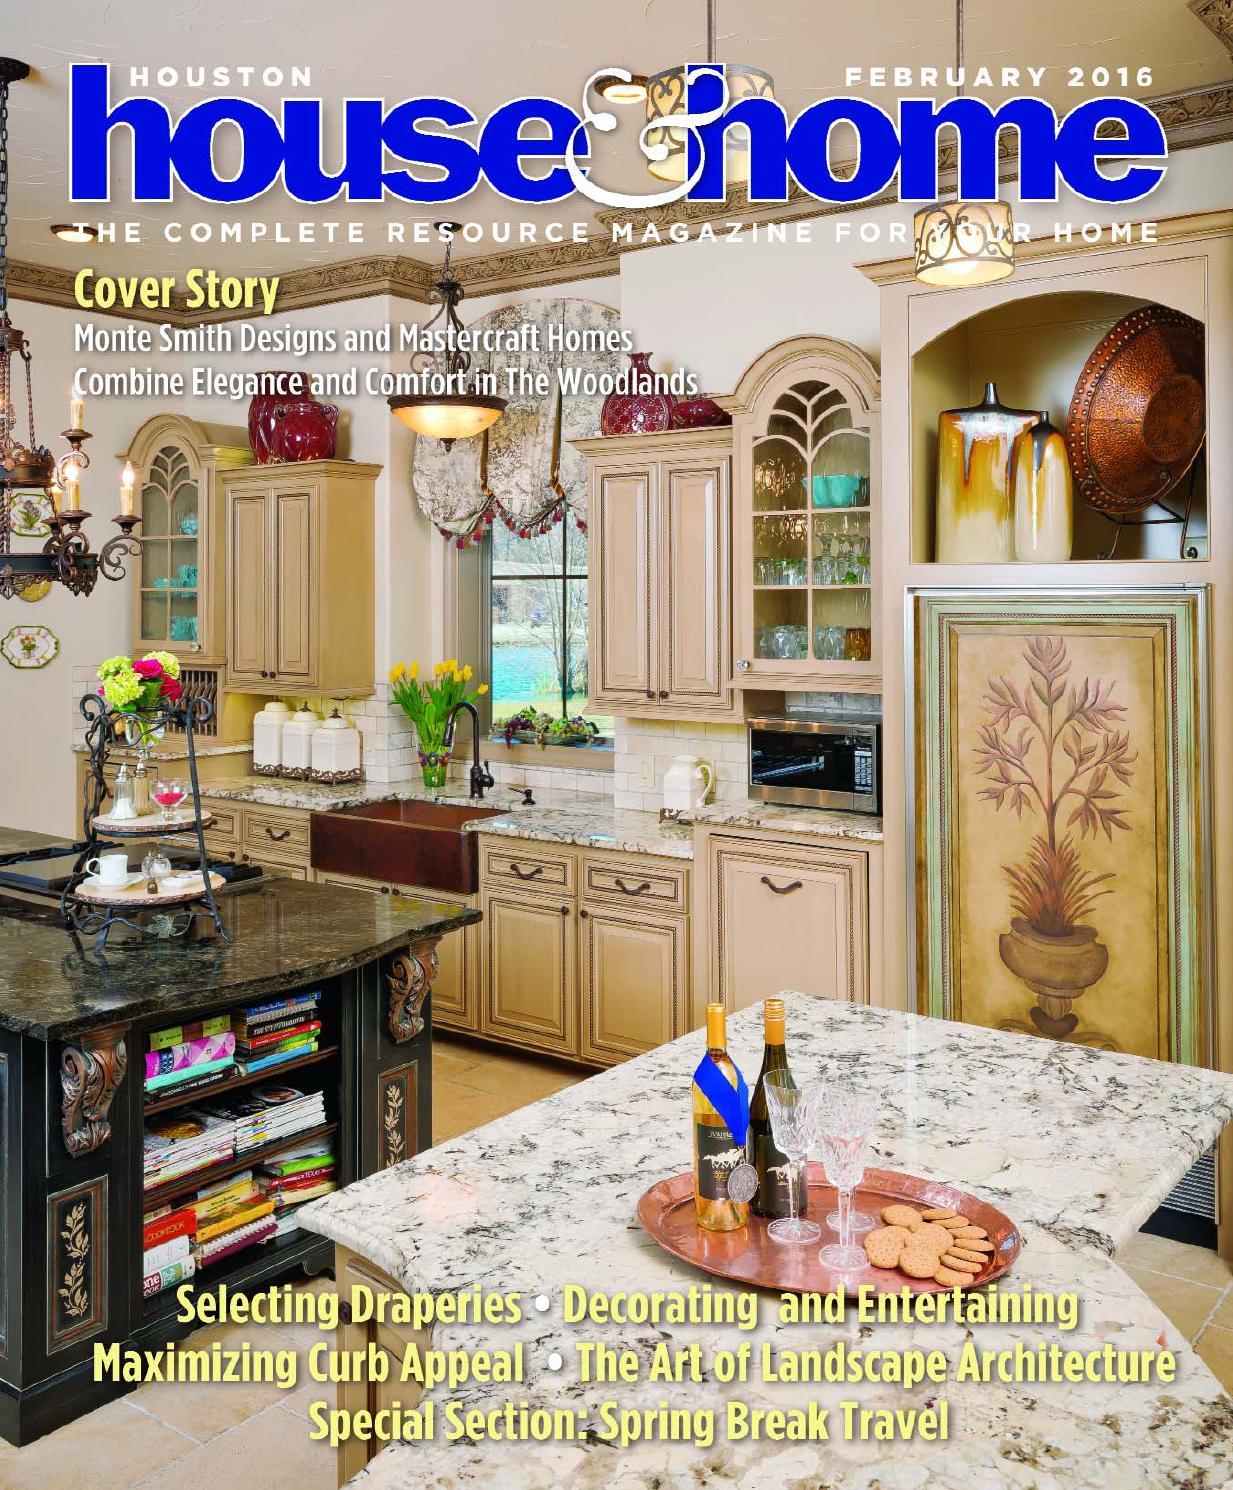 0216 houhousehome vir by houston house home magazine issuu